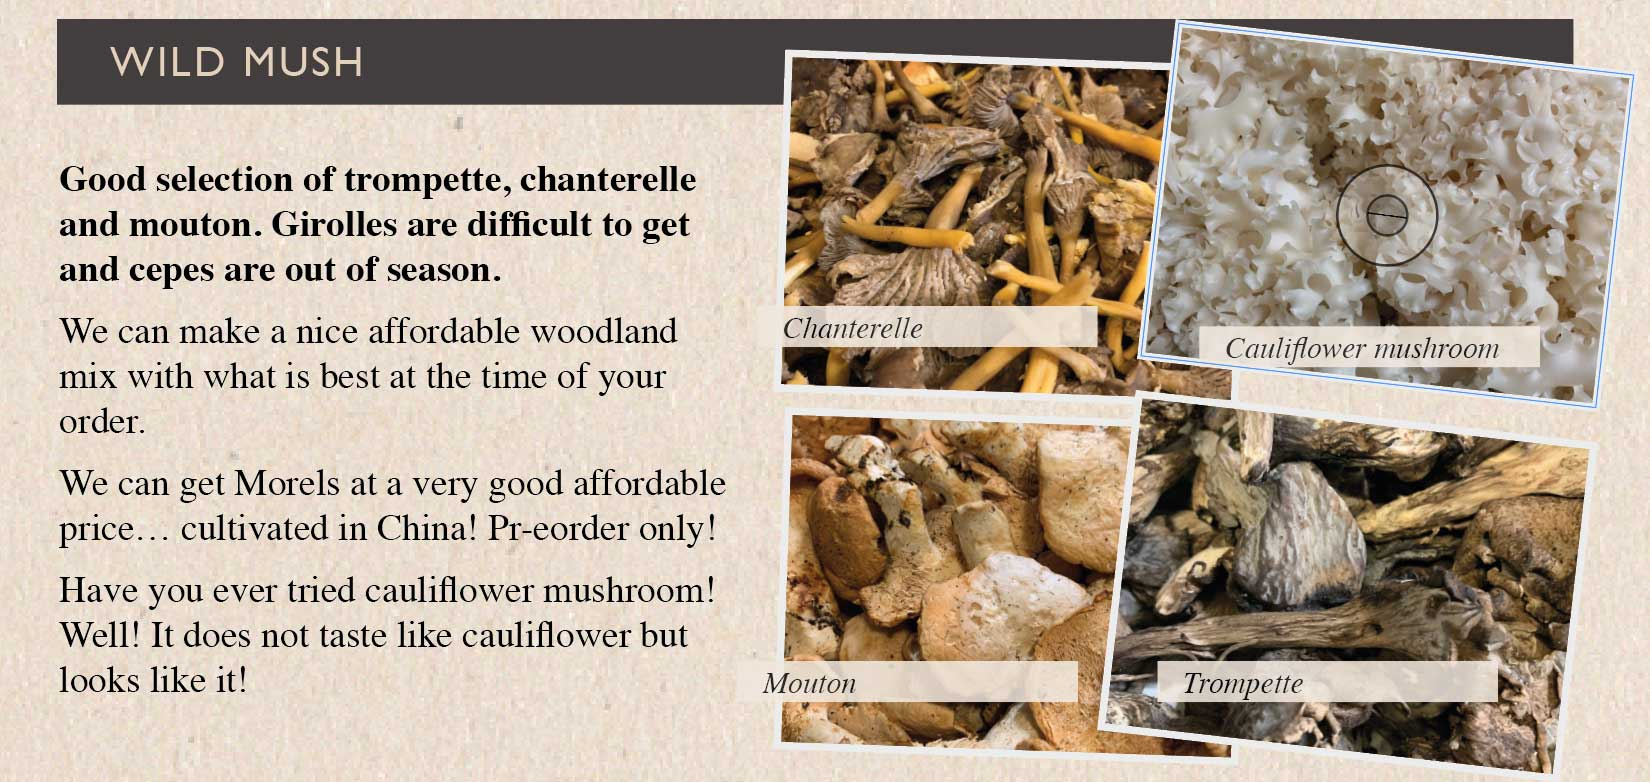 wild-mushrooms2-smith-and-brock